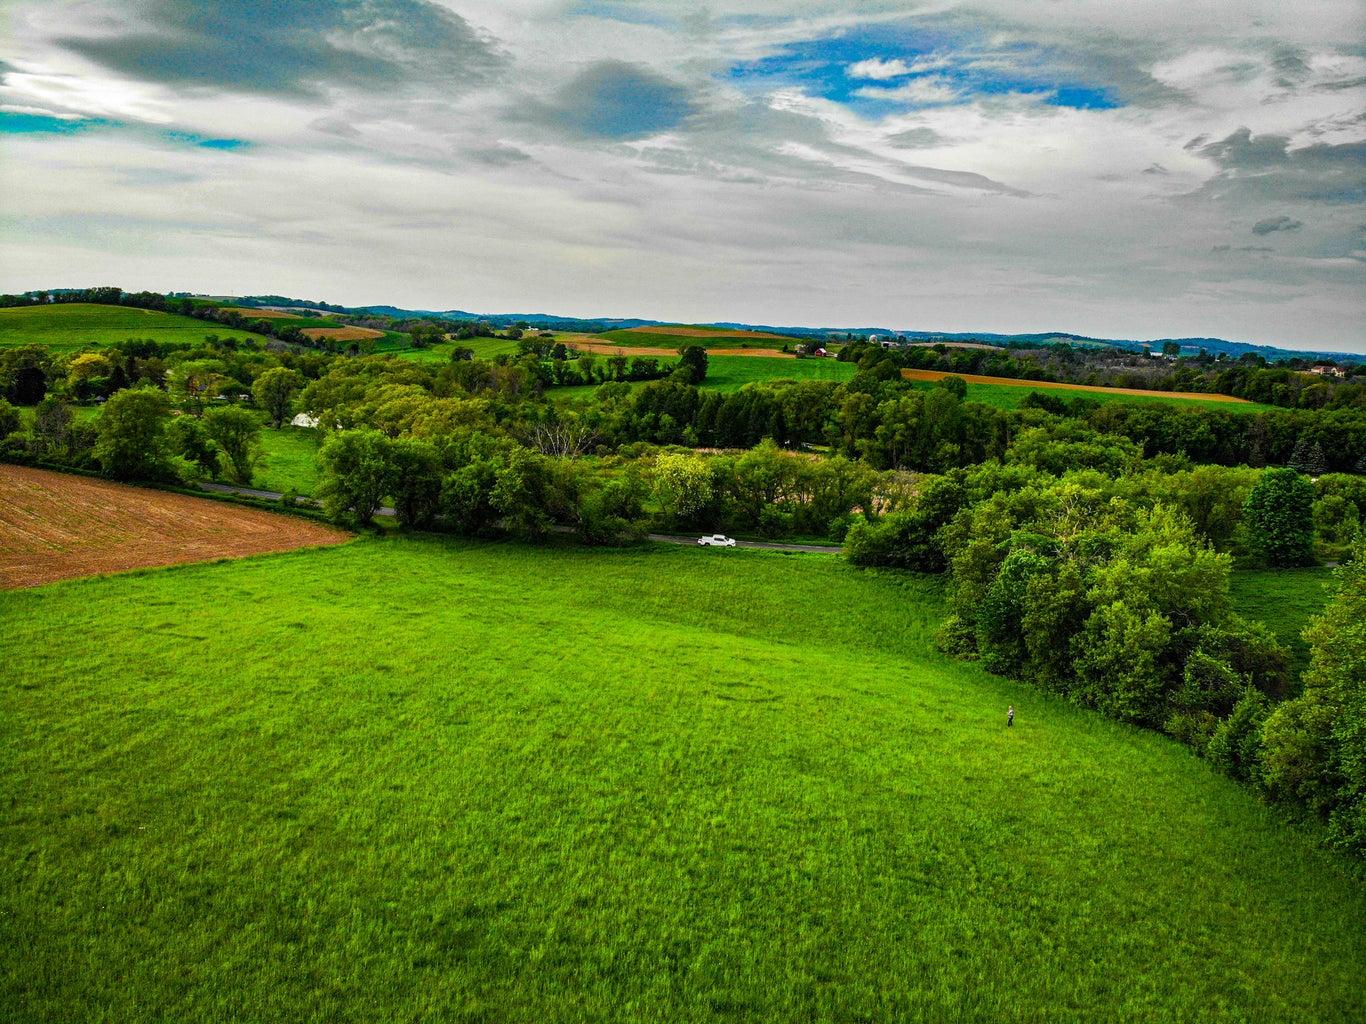 Al Wisnefske_Fond Du Lac County-01